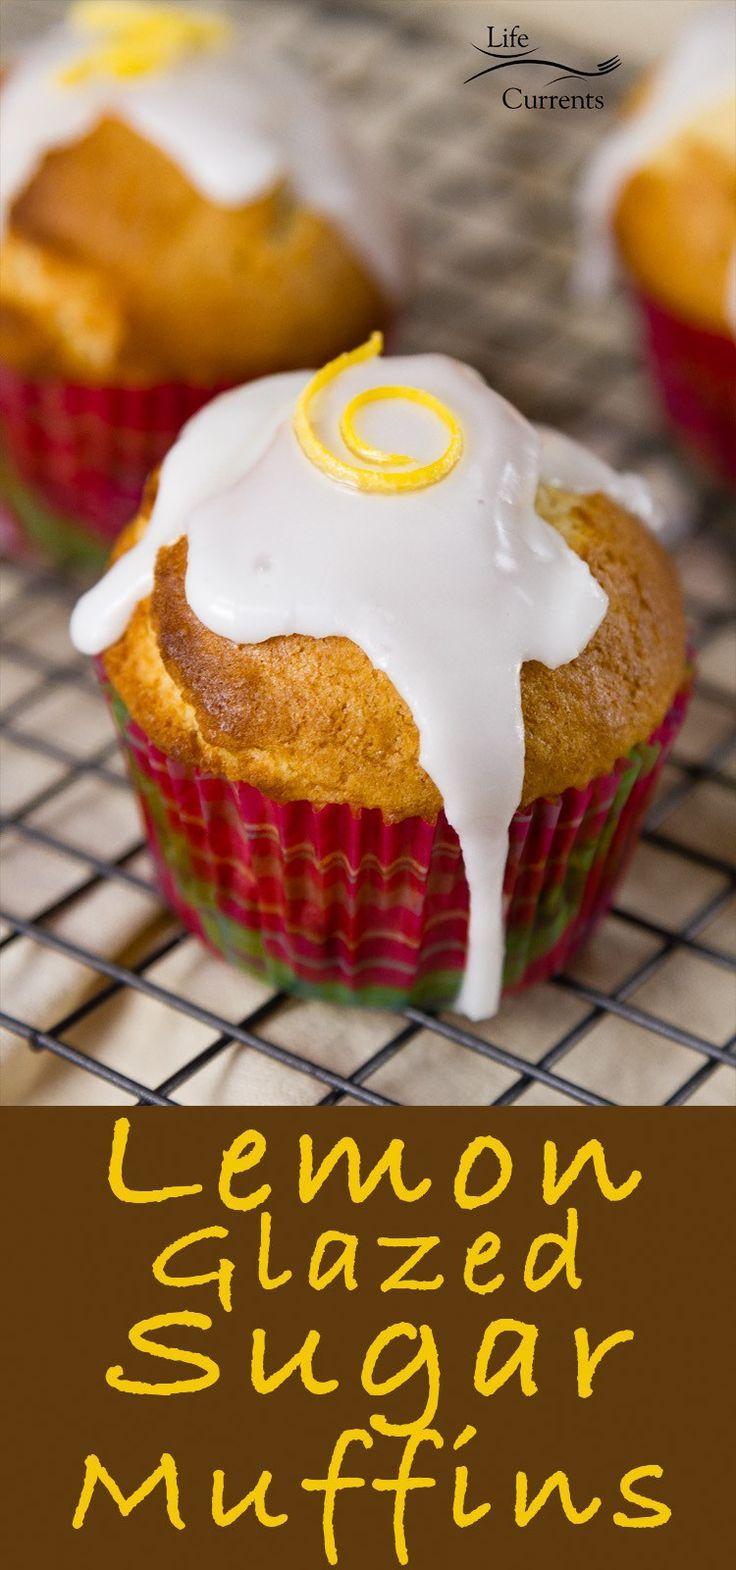 Lemon Glazed Sugar Muffins - Tangy sweet lemon glaze tops a nice dense and not too sweet vanilla cake muffin